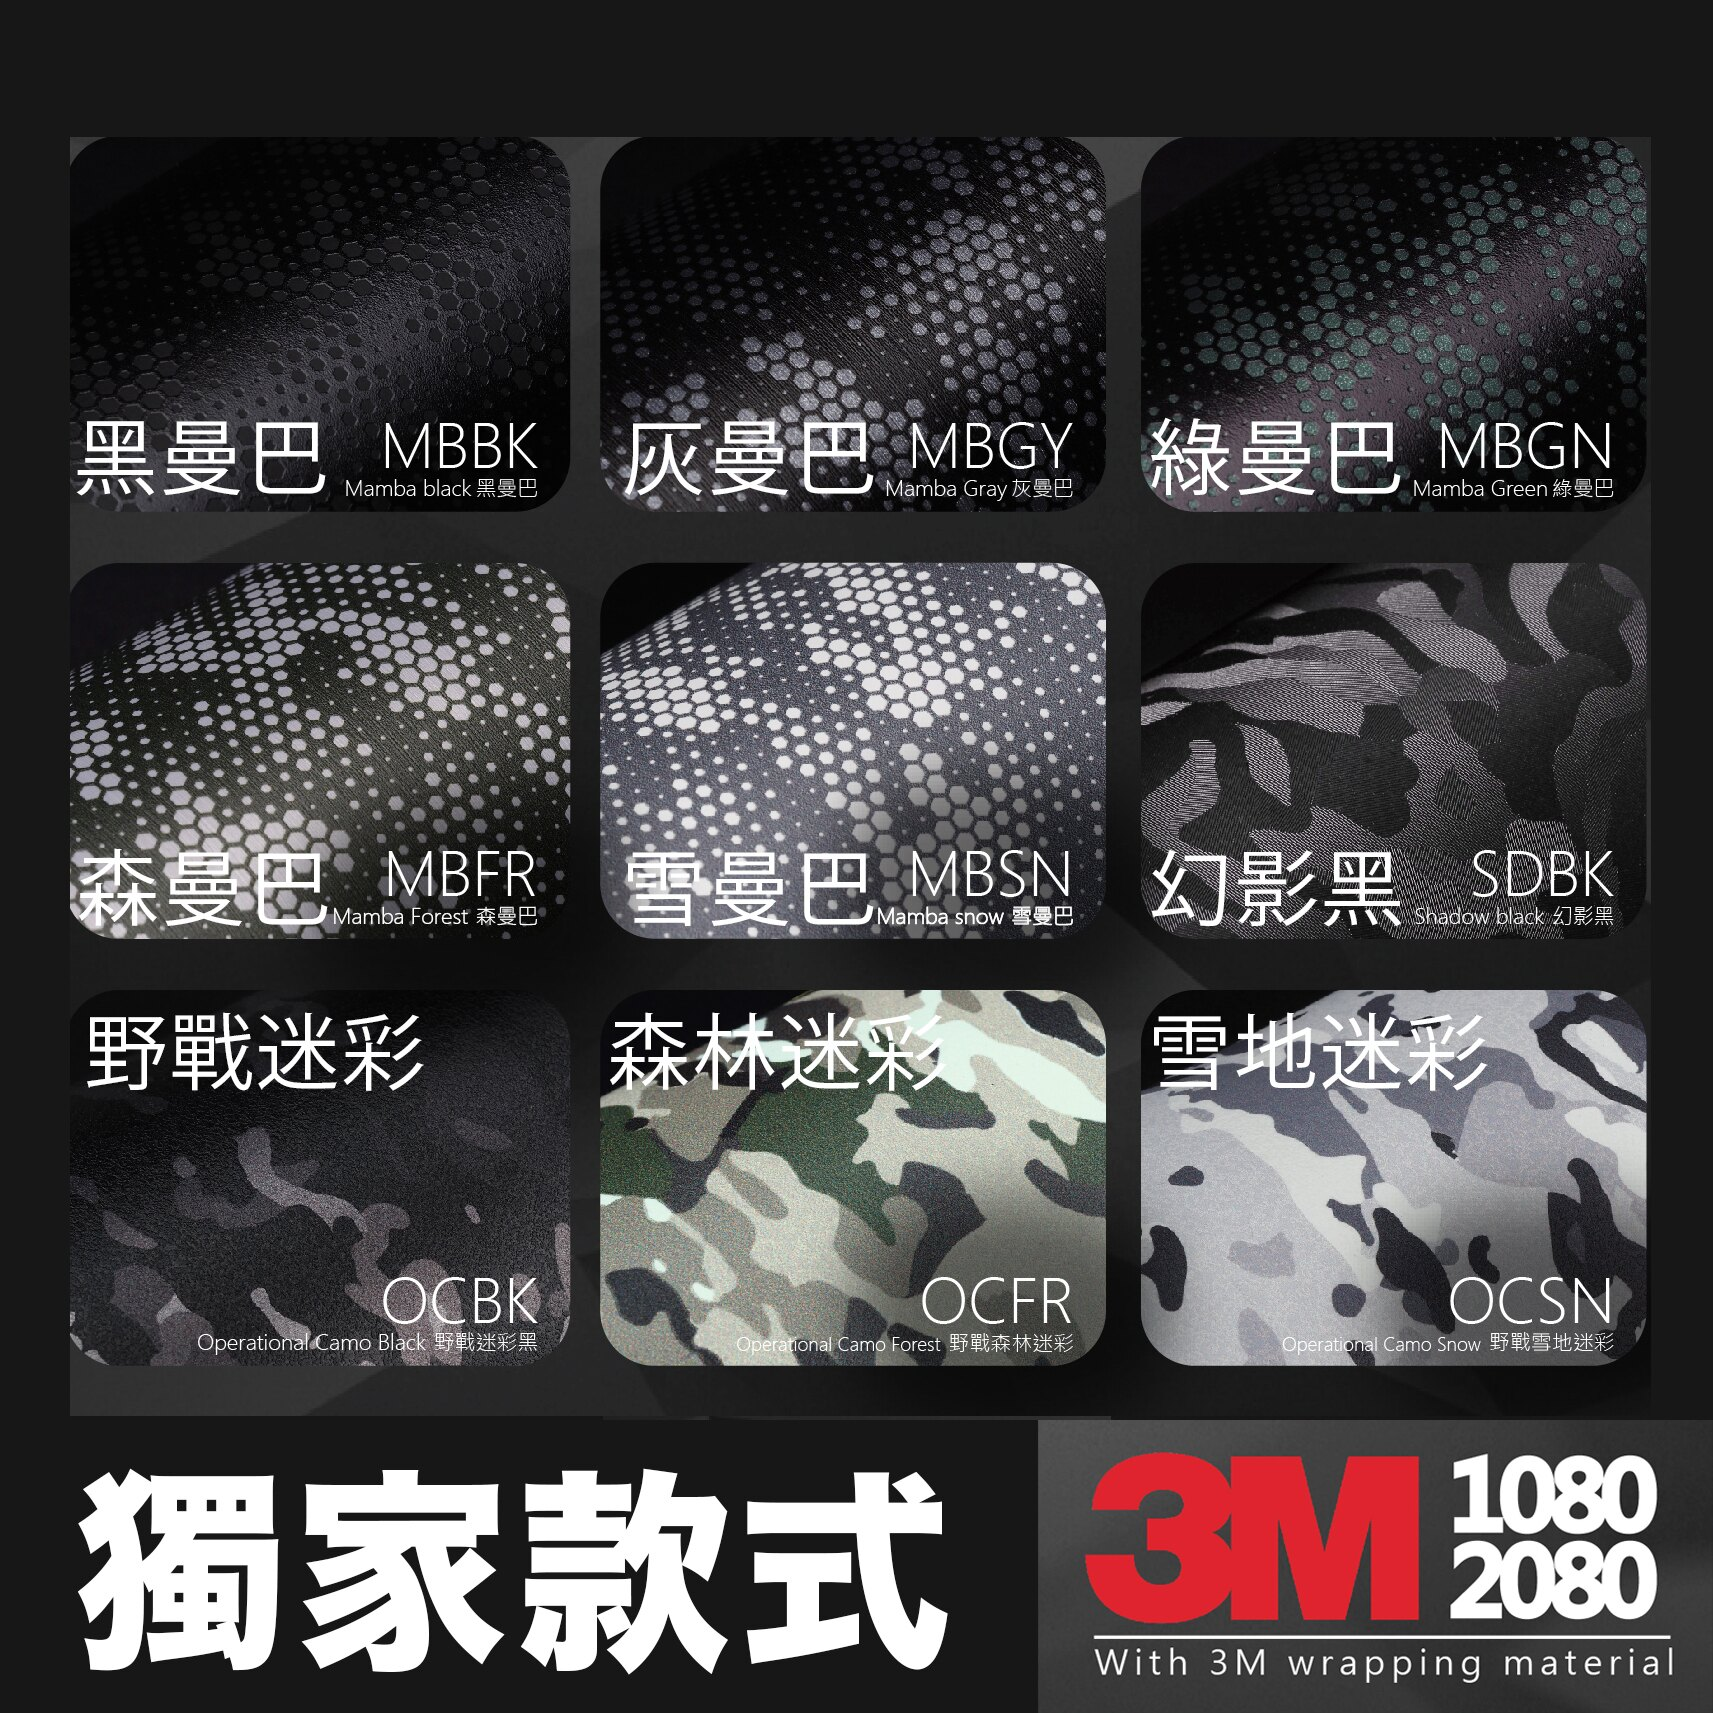 LIFE+GUARD 相機 鏡頭 包膜 SONY E 70-350 mm F4.5-6.3 G OSS (獨家款式)